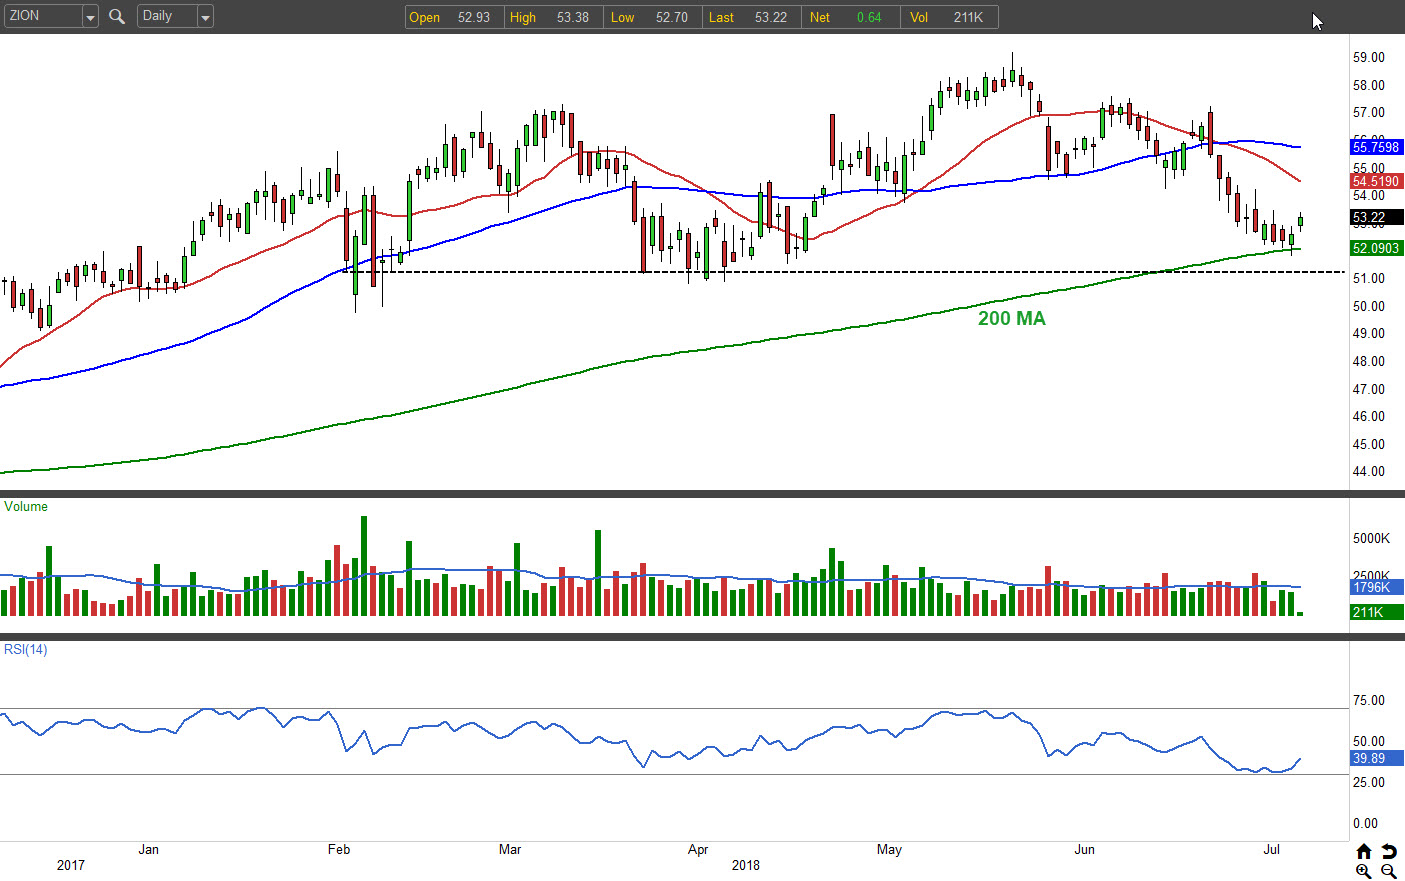 3 Beaten-Down Bank Stocks to Buy: Zions Bancorp (ZION)